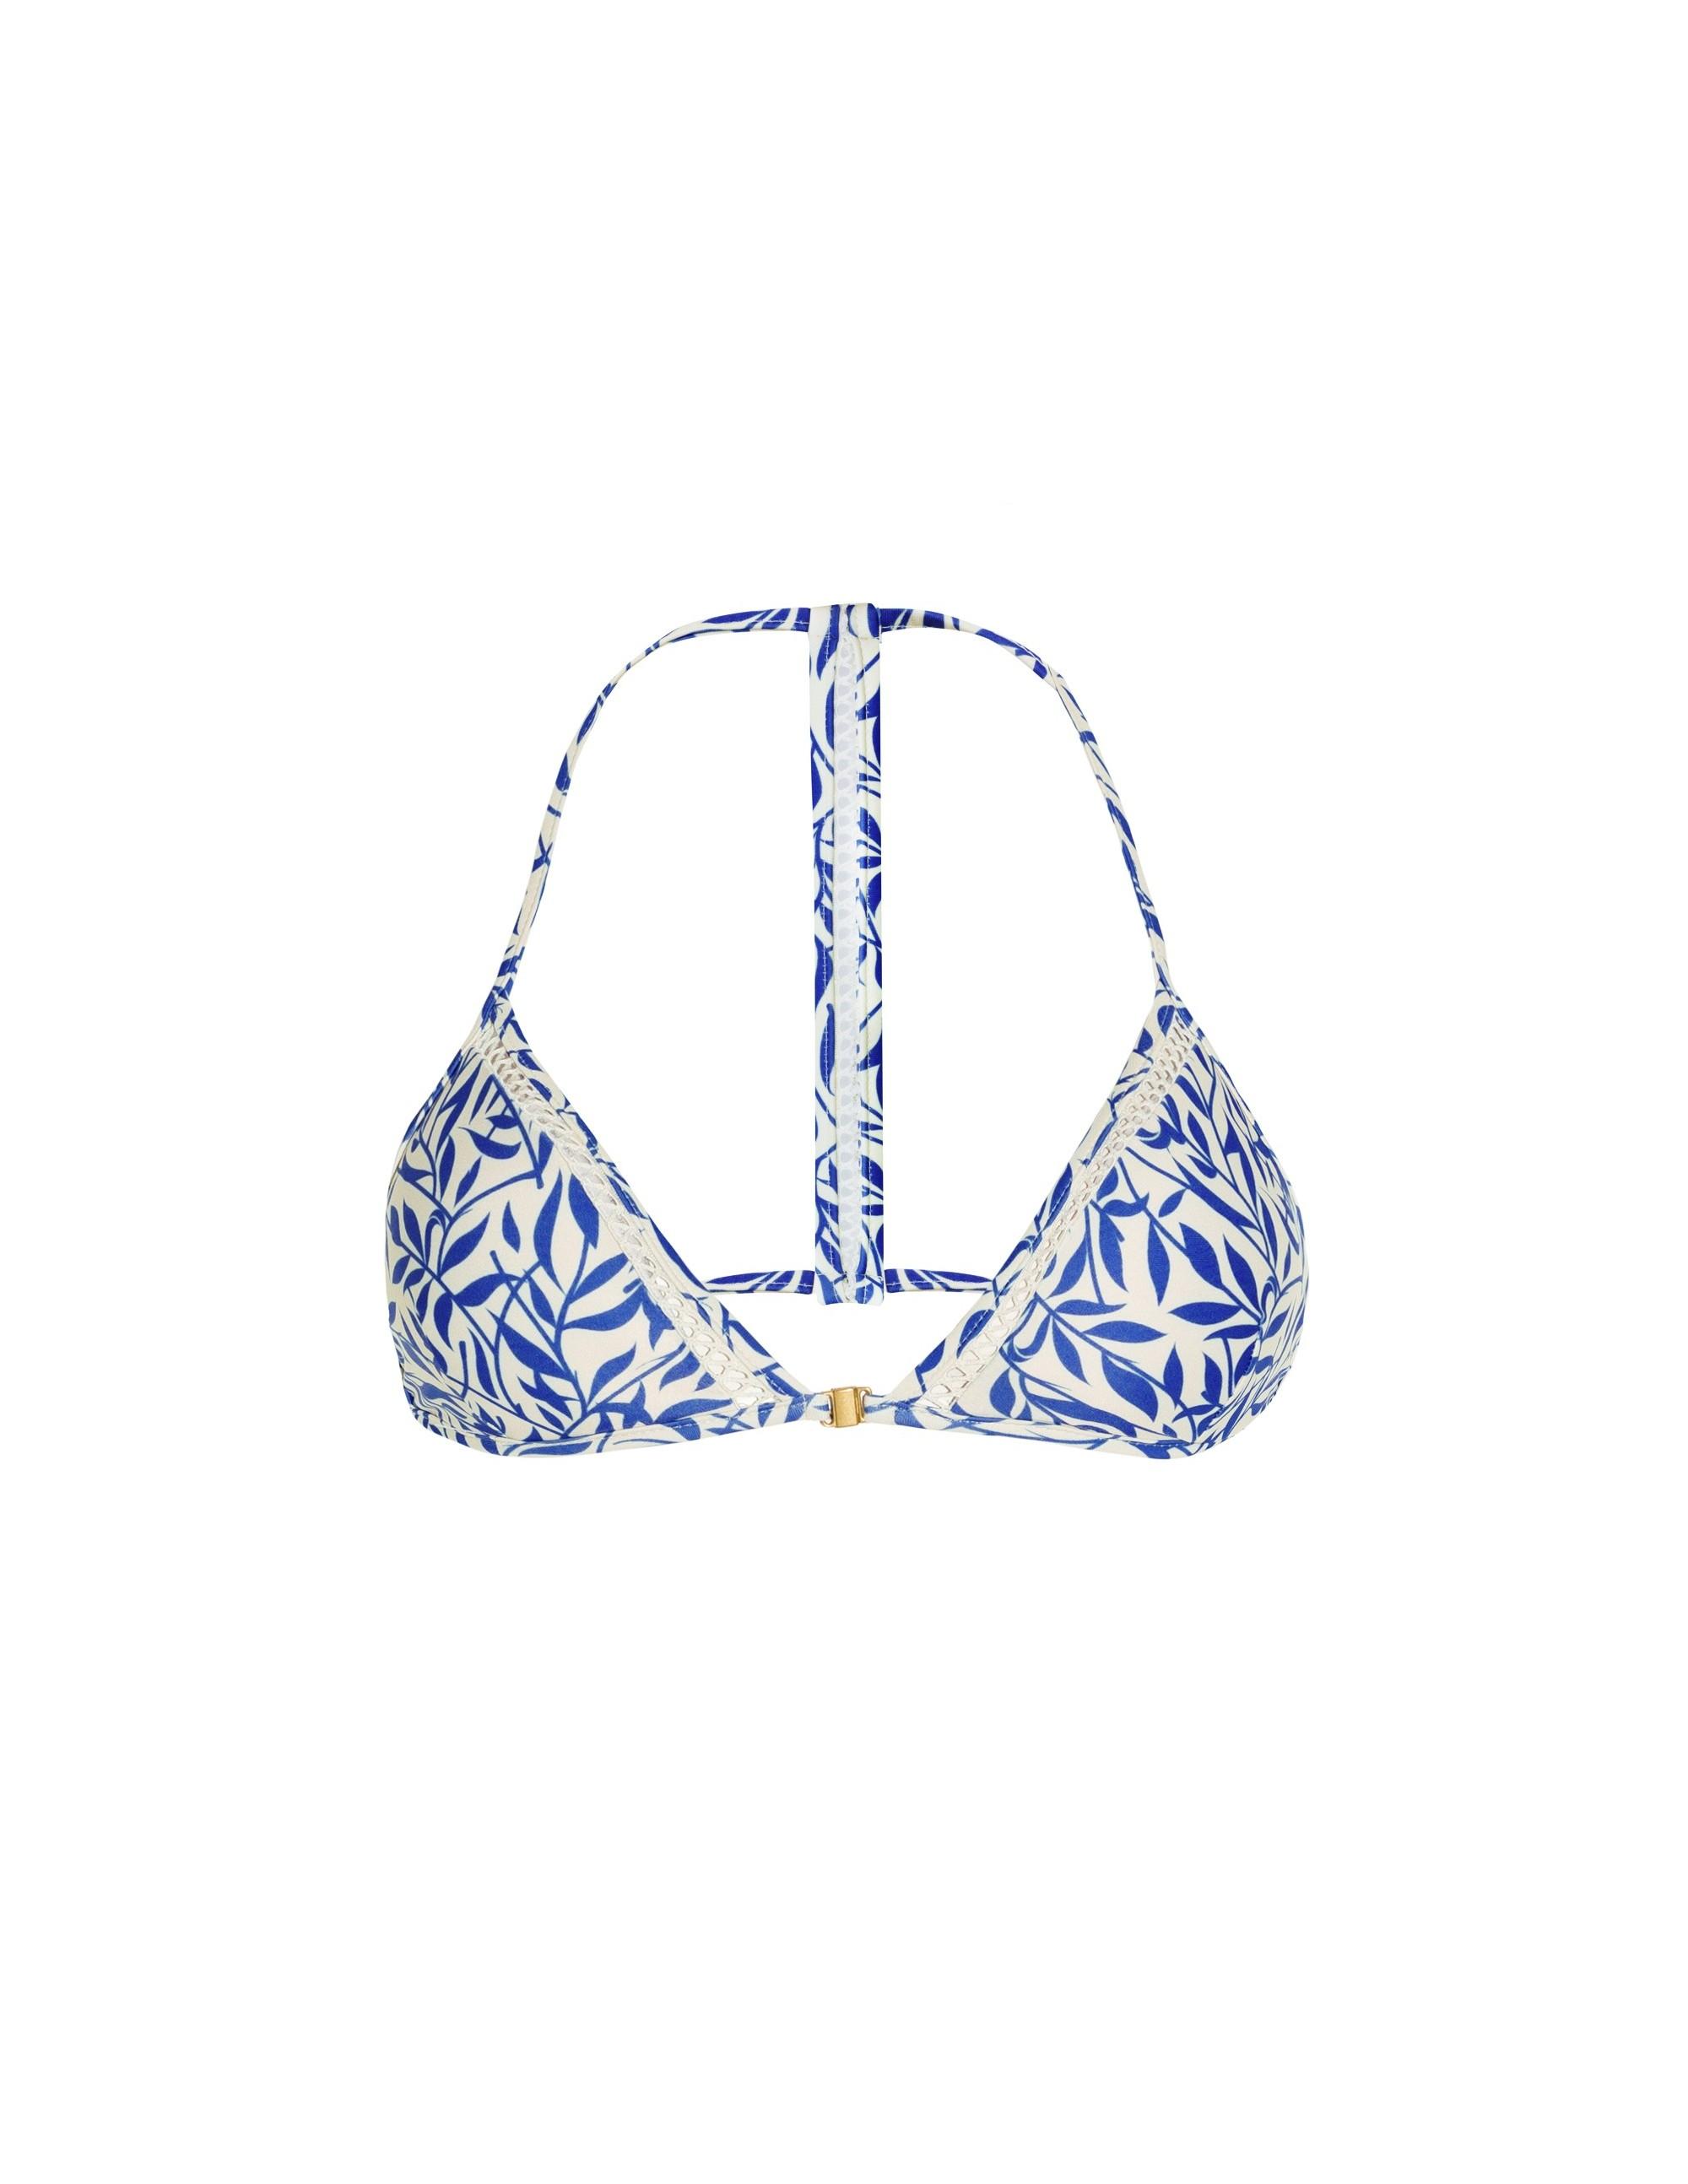 7b3c4f17f3c4e Triangle bikini top Anamur with crochet details